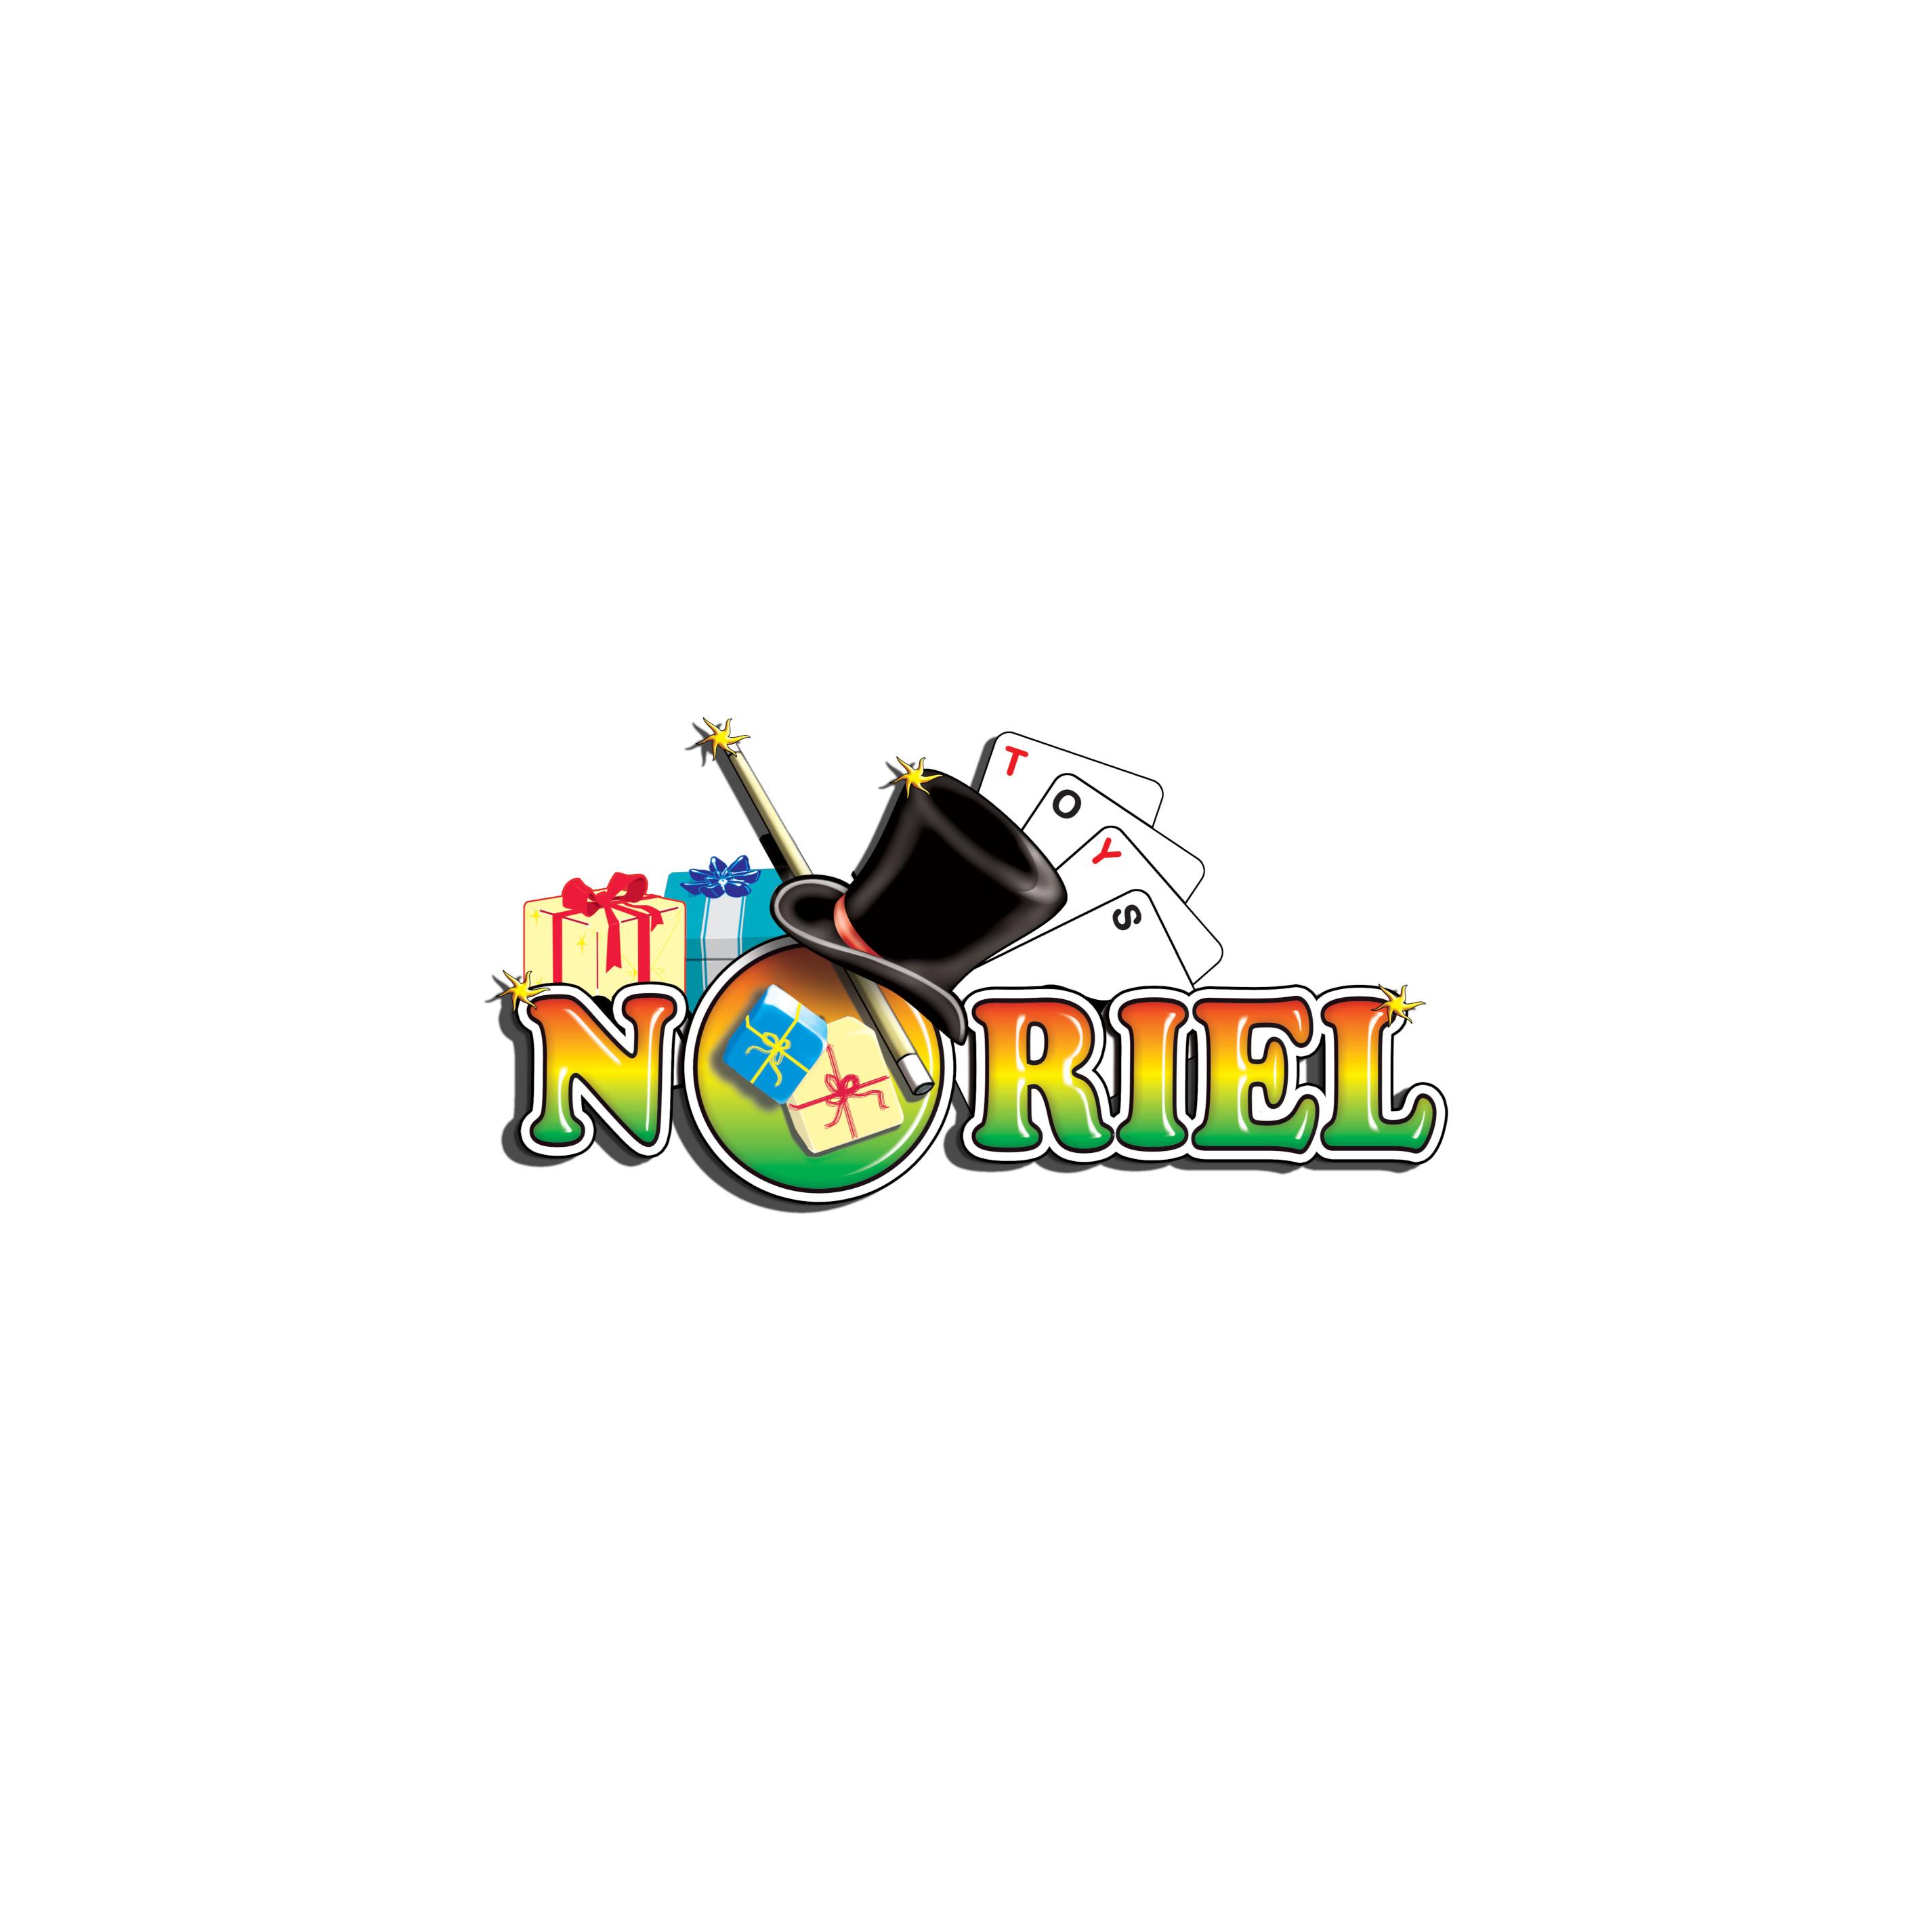 Olita copii Lorelli Classic Disney Winnie the Pooh - Galben